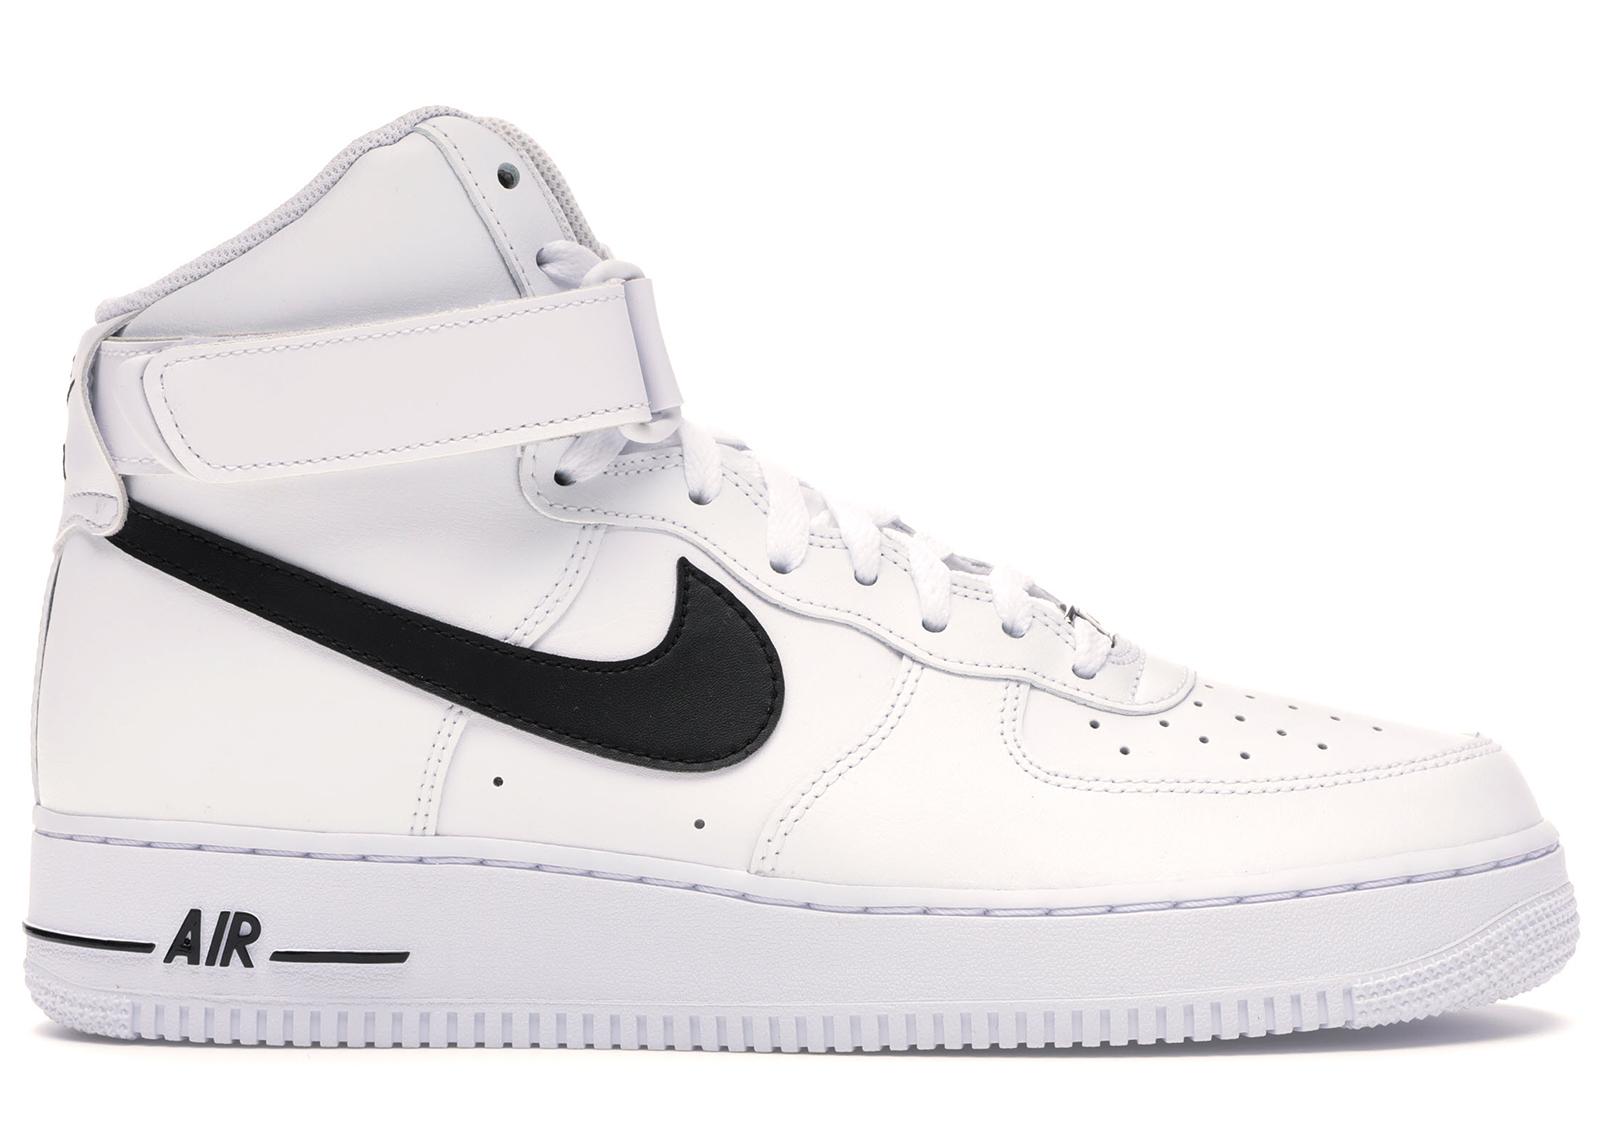 Nike Air Force 1 High White Black - CK4369-100